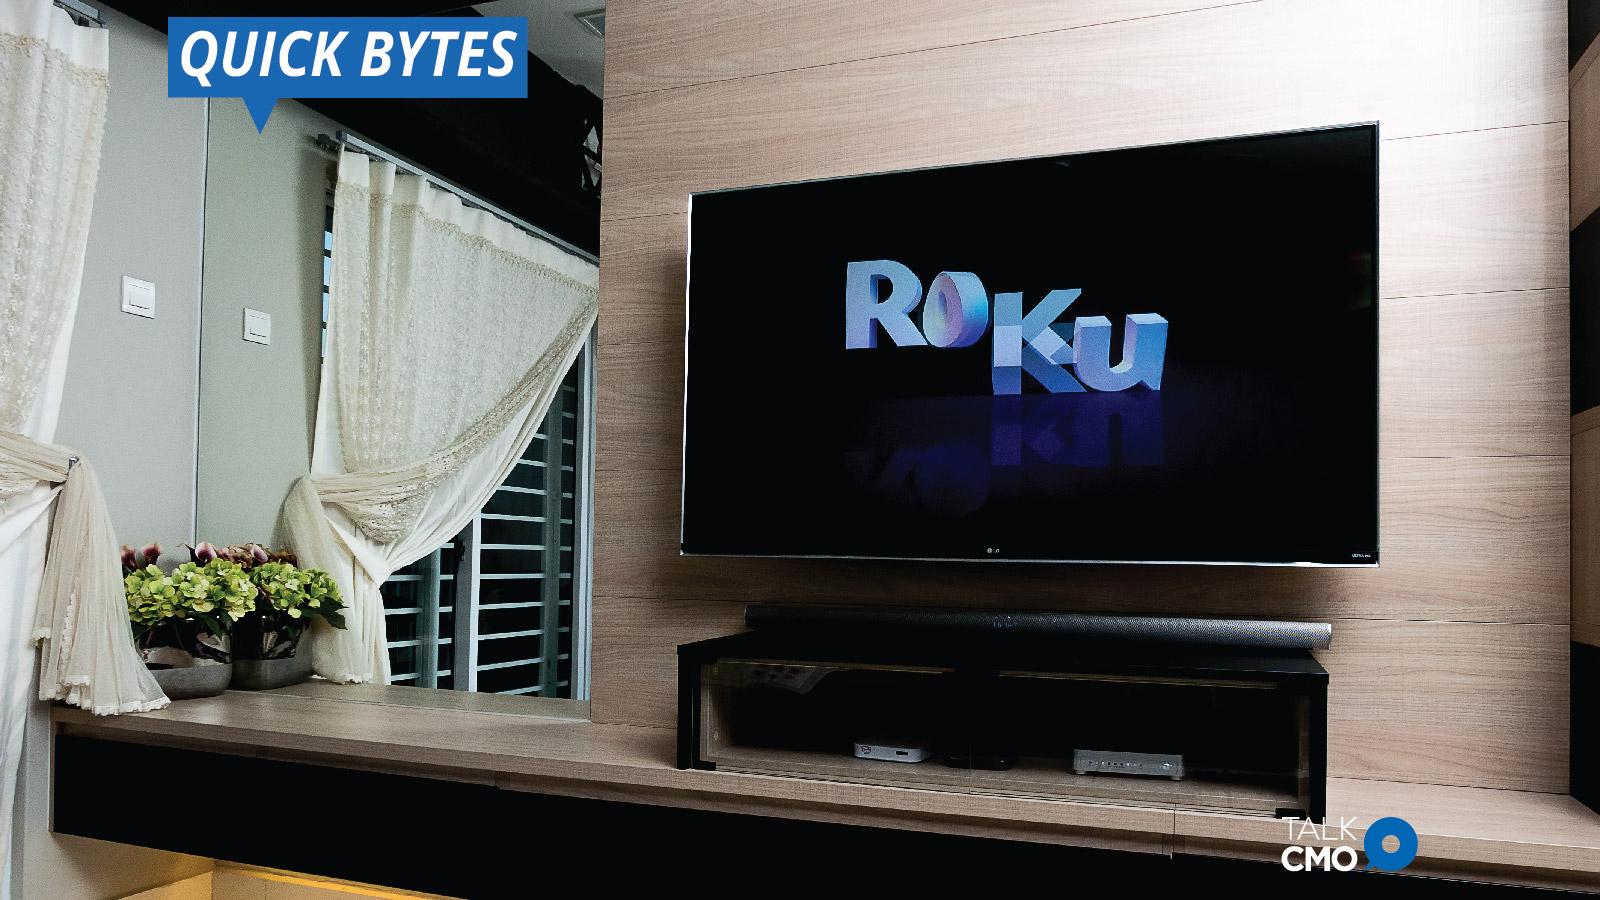 Roku Targets UK As Smart TV Platform Duel With Amazon Hots Up